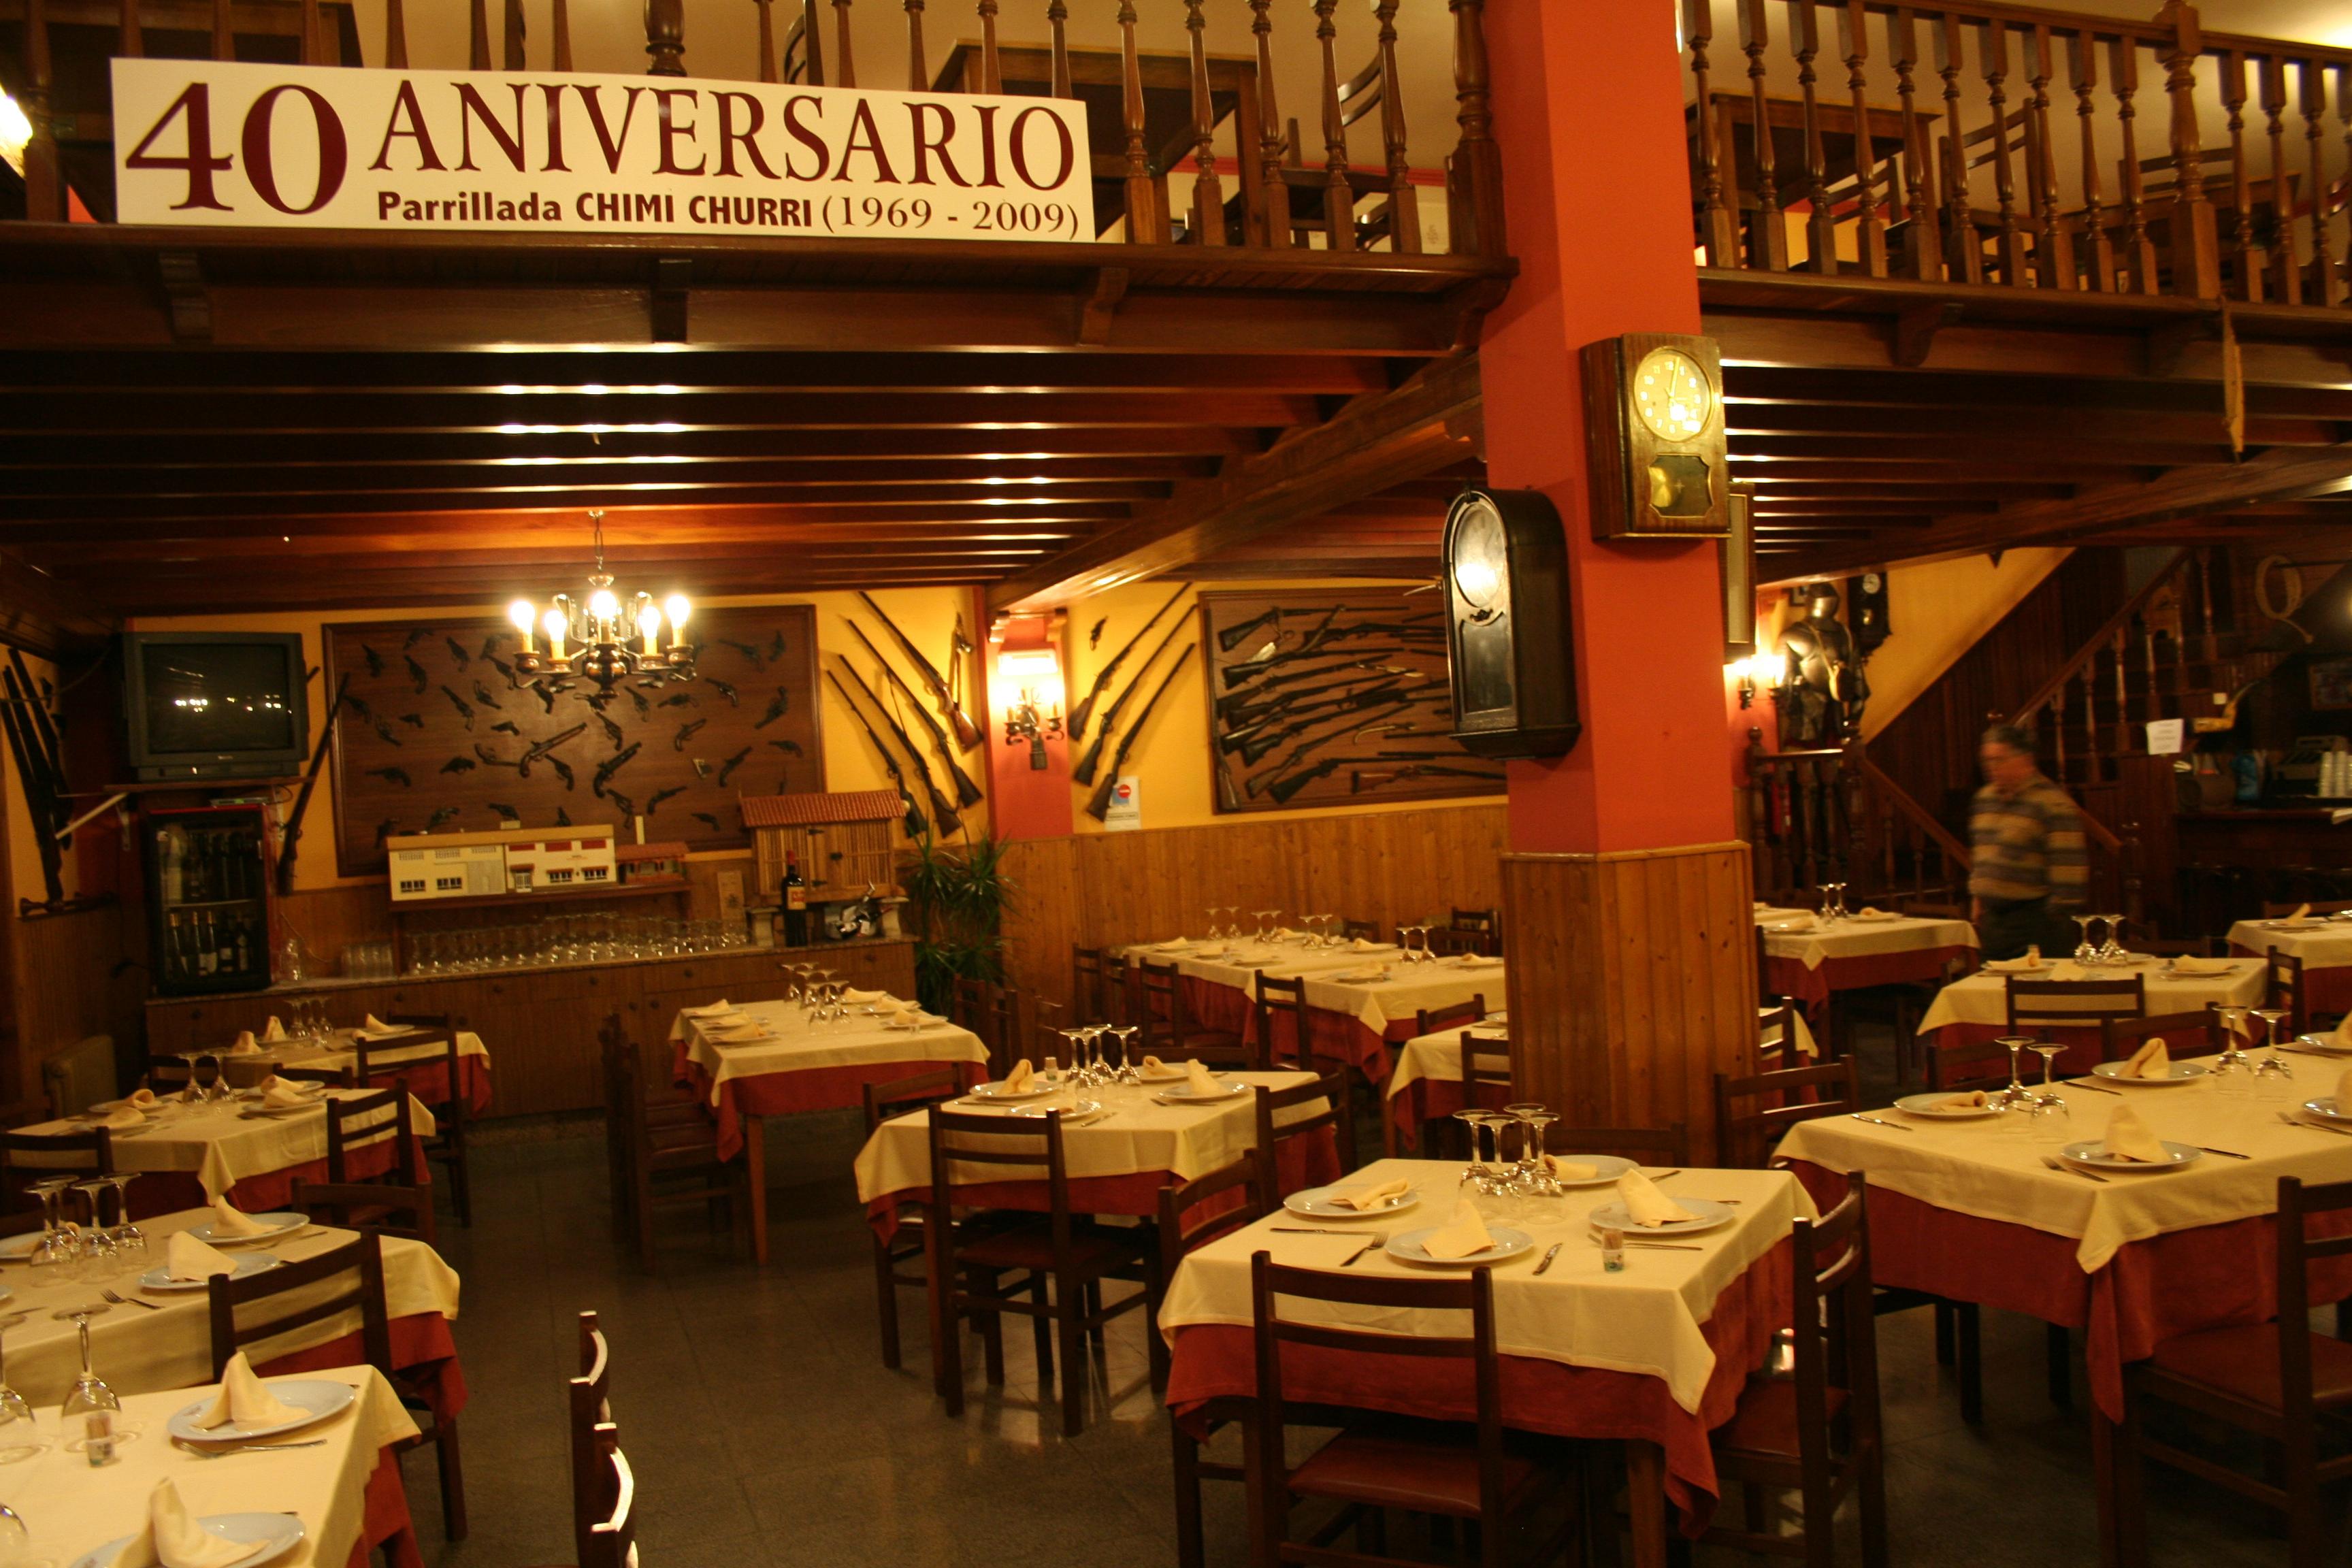 Parrillada chimi churri betanzos for Paginas de chimentos argentina